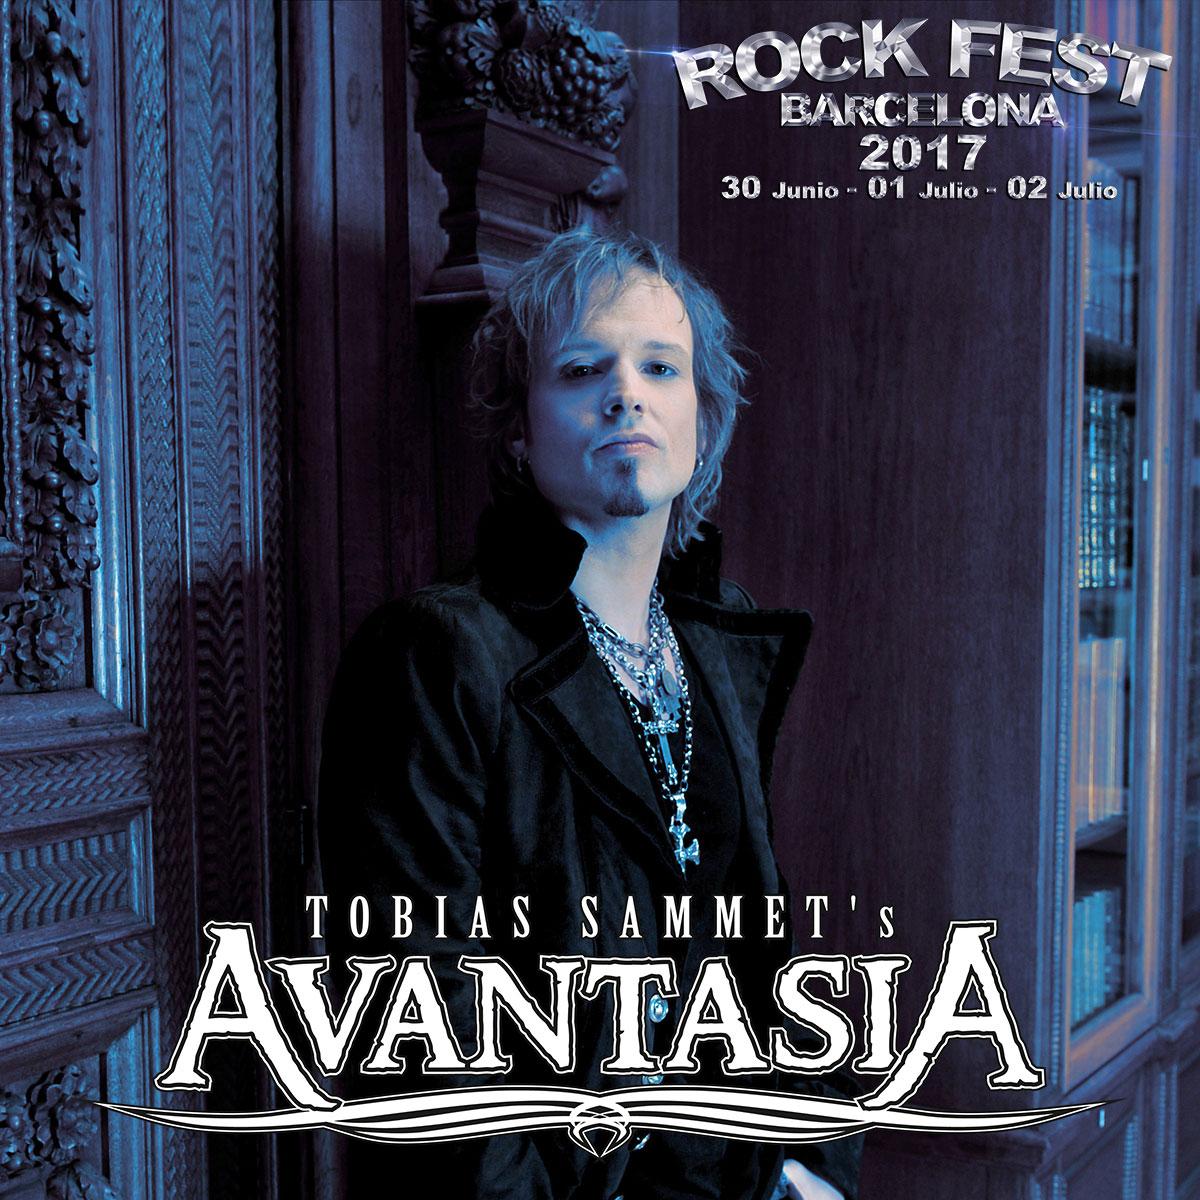 RockFestBarcelona_Avantasia